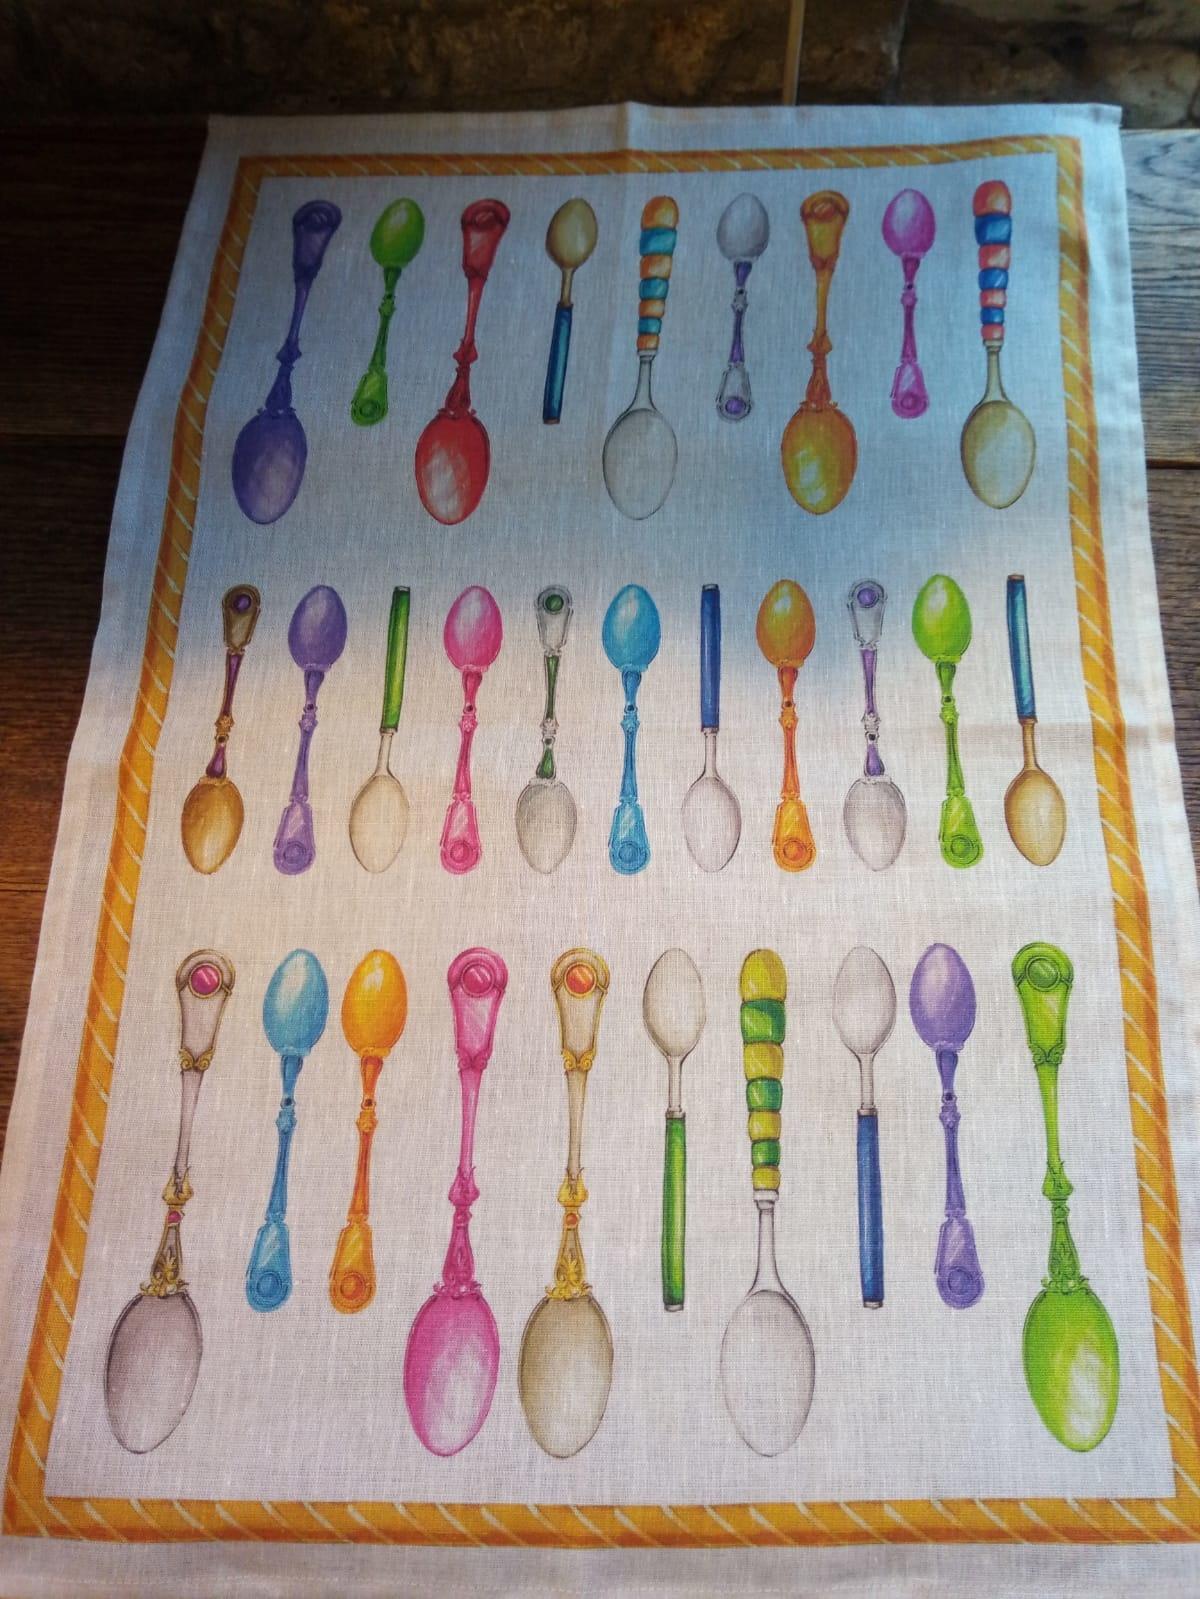 Spoon tea towel